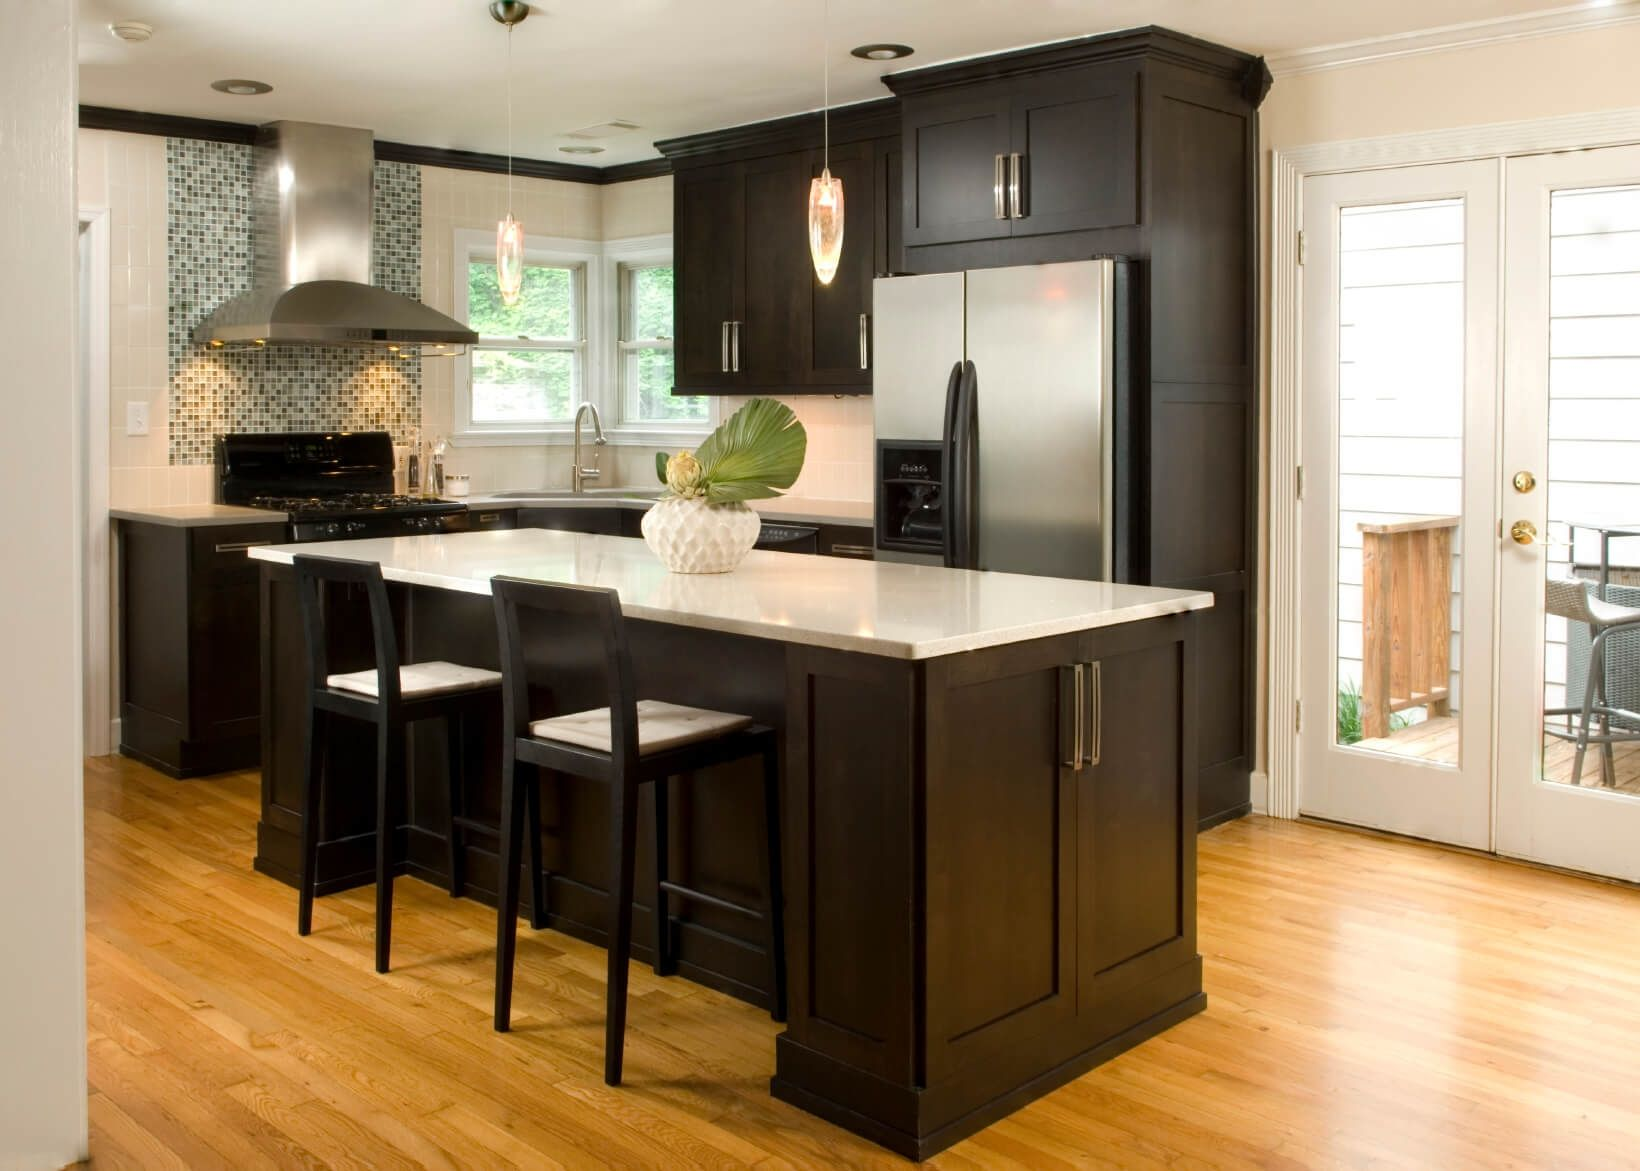 Show me black kitchen cabinets kitchen cabinets pinterest